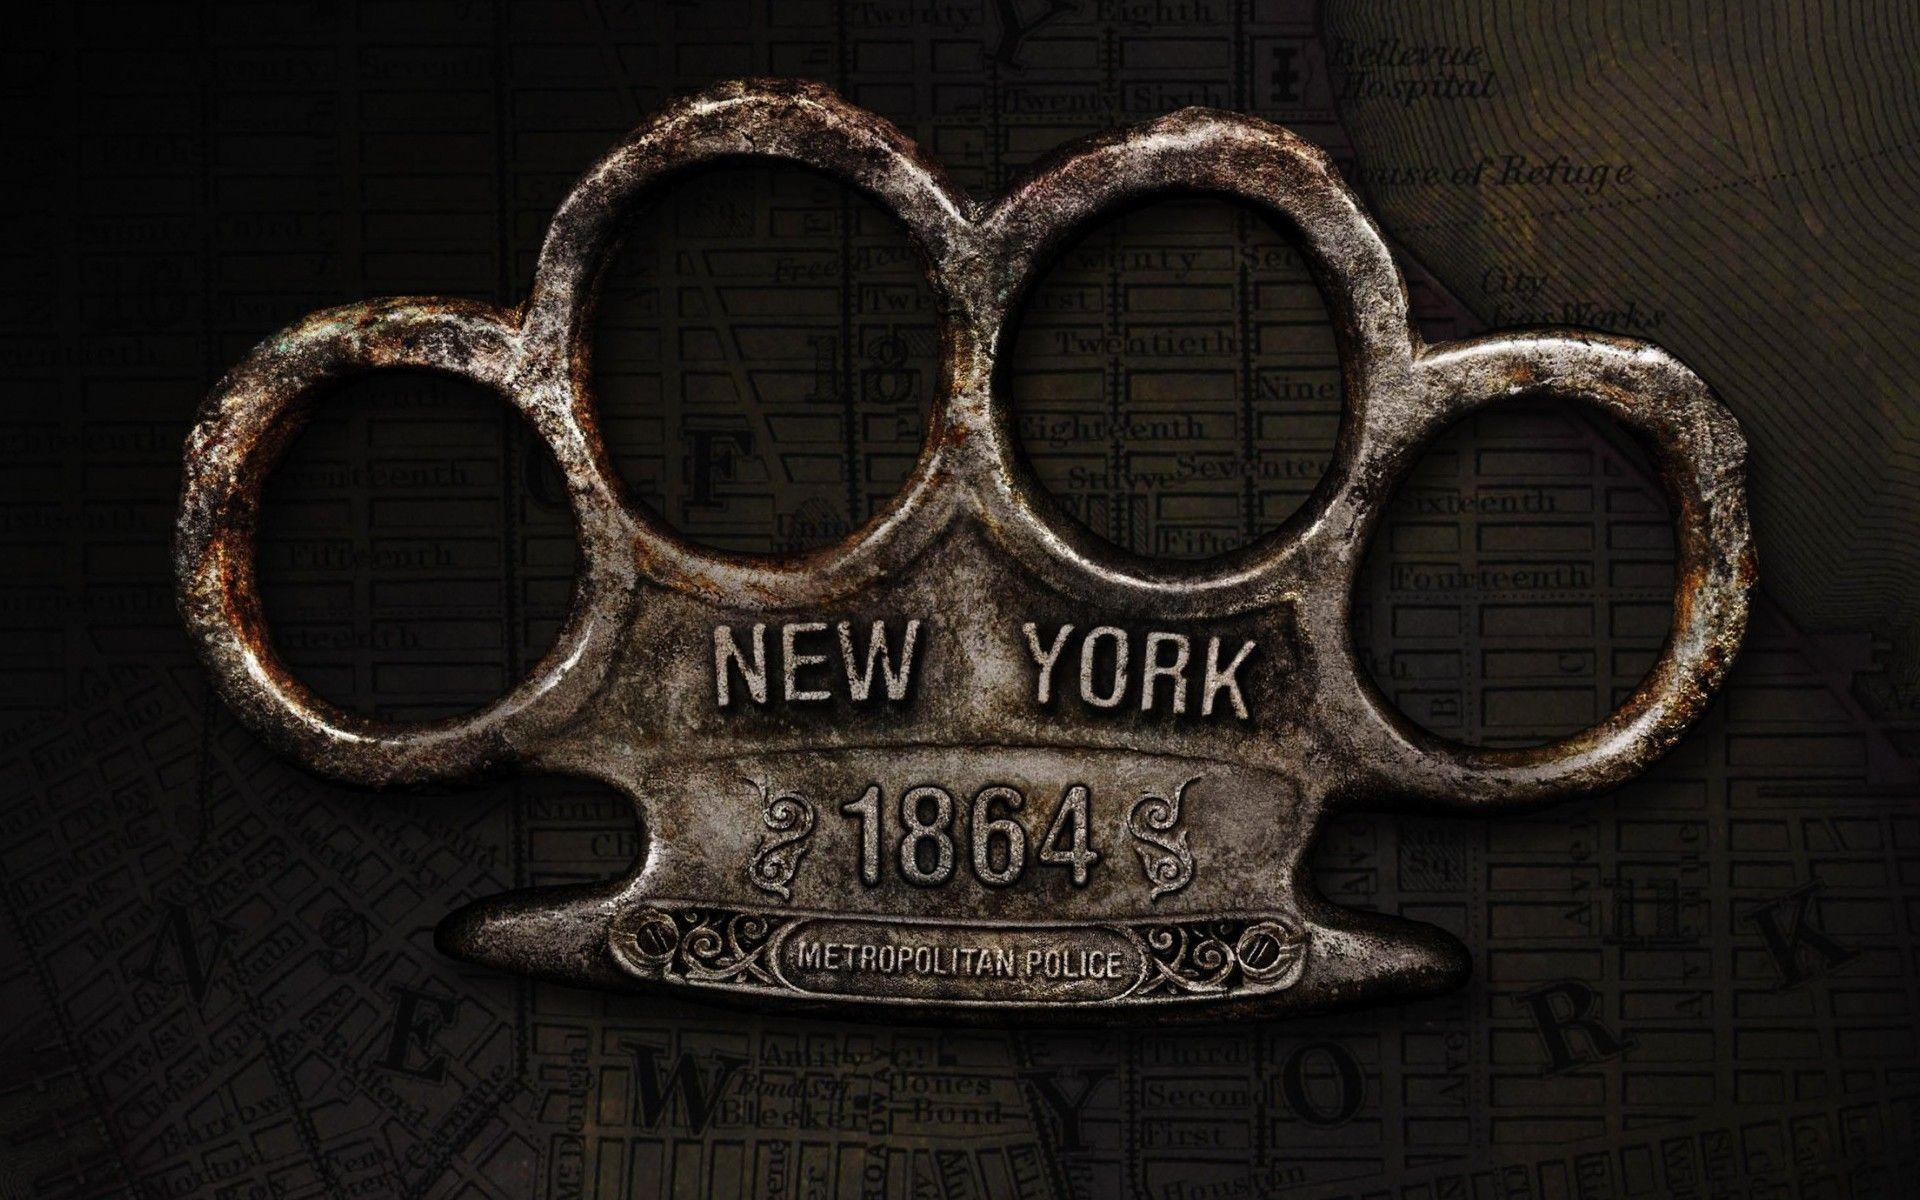 Desktop Wallpaper - police new york city metropolitan 1864 knuckle ...